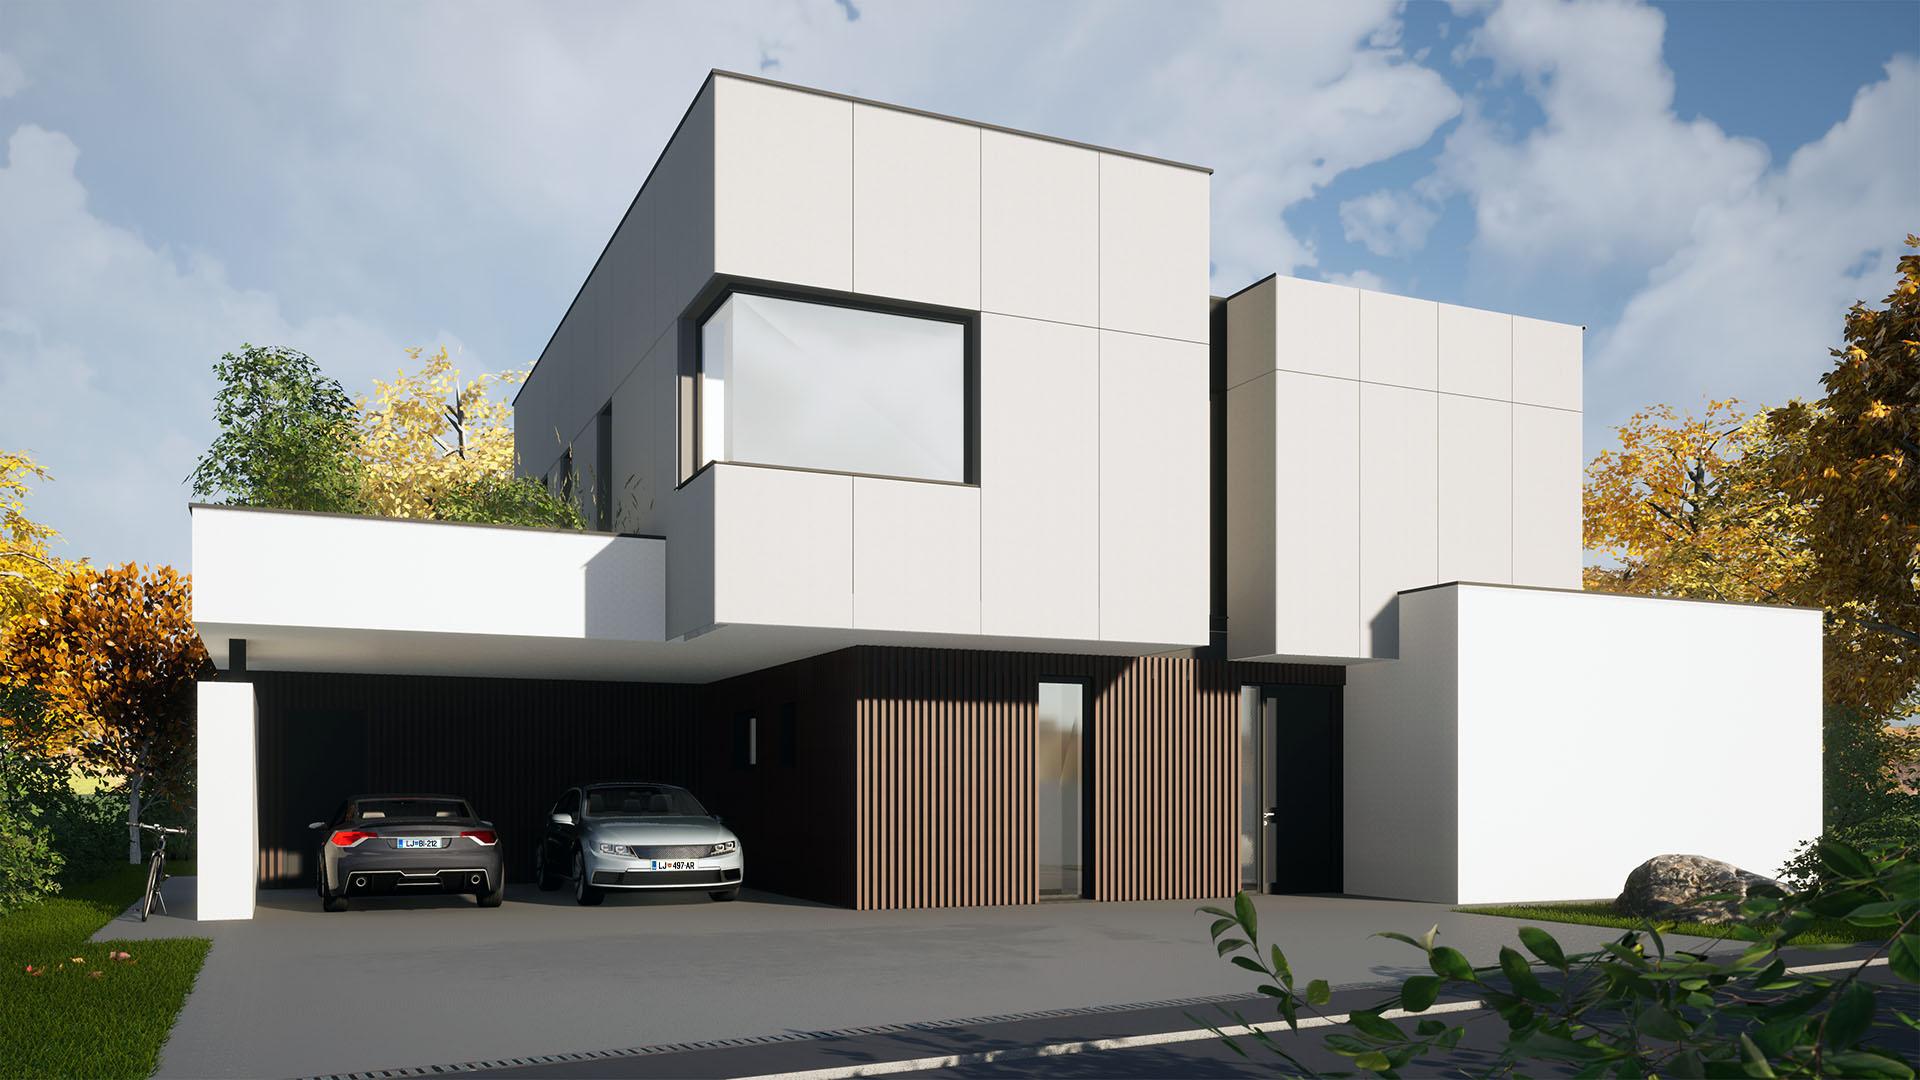 Stanovanjska hiša HD Domžale